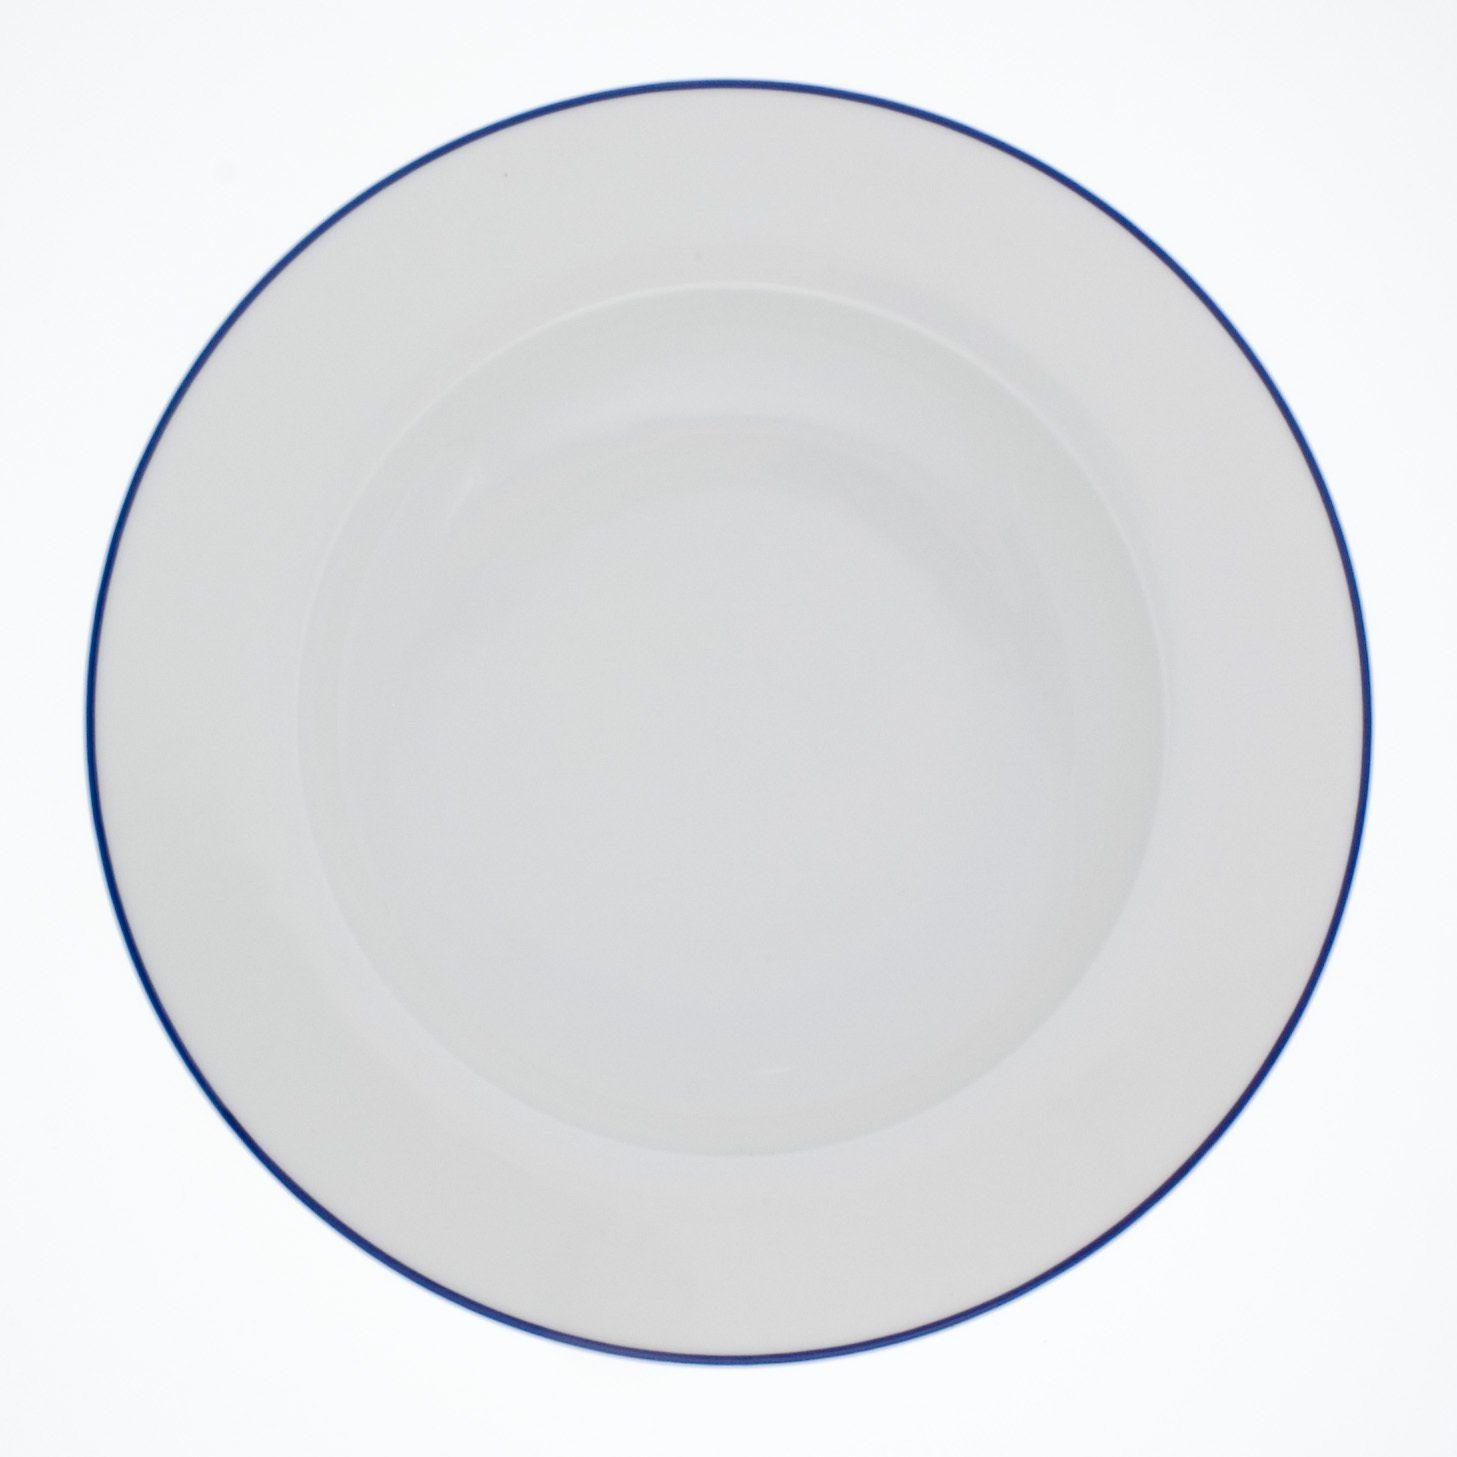 Kahla Suppenteller »Aronda Blaue Linie«